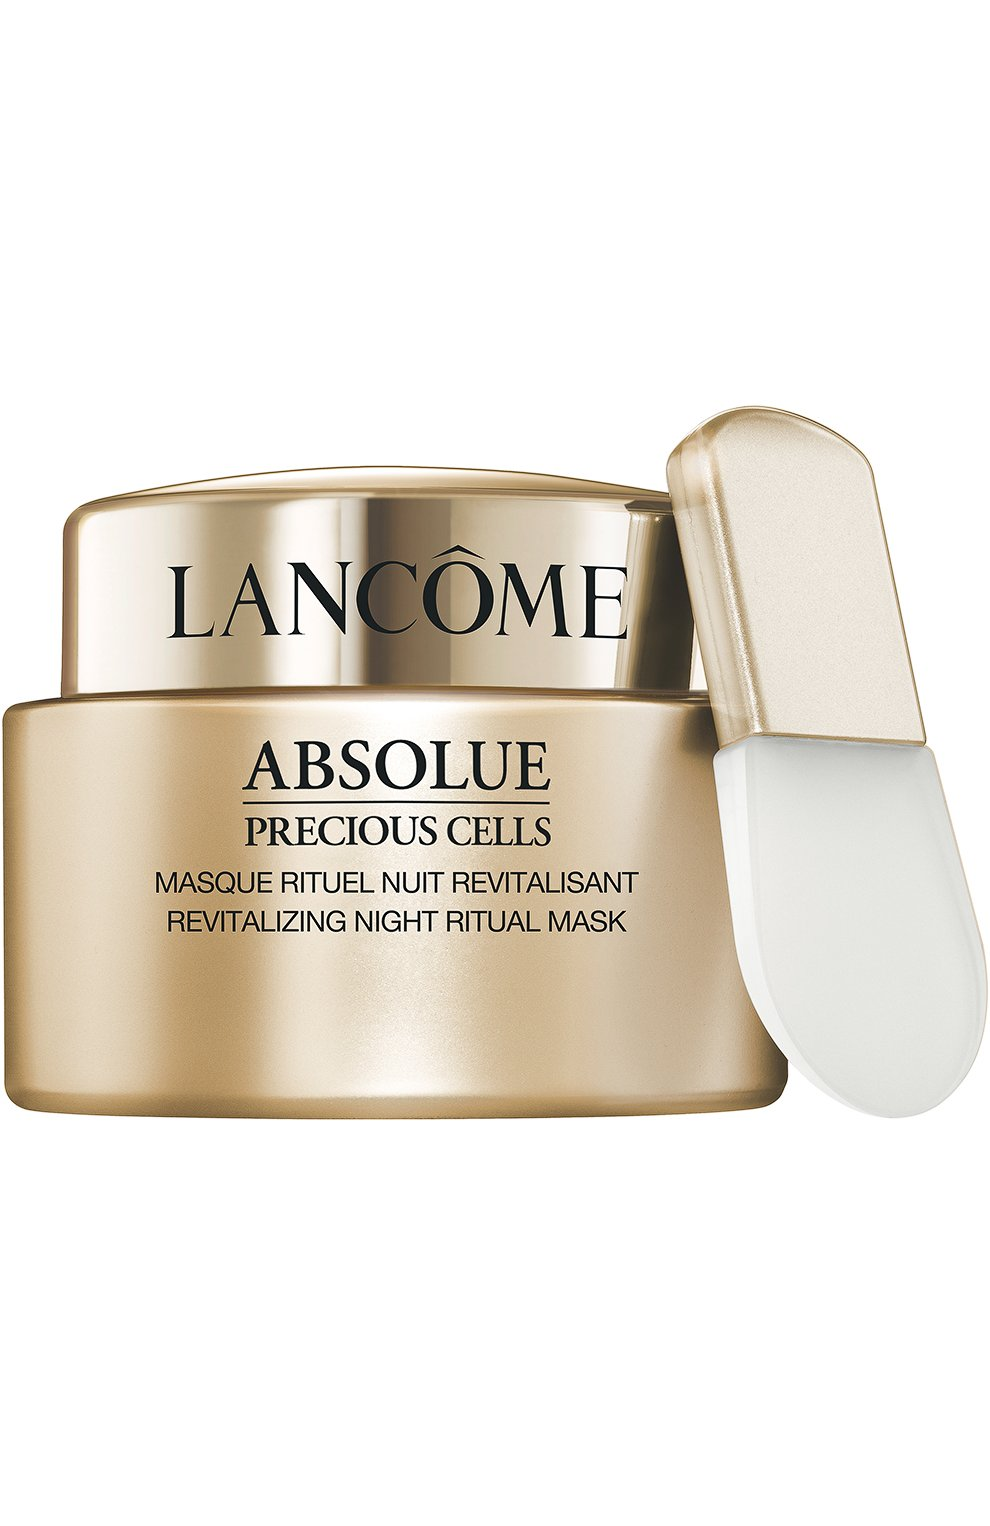 Ночная восстанавливающая маска для лица Absolue PC Lancome | Фото №1